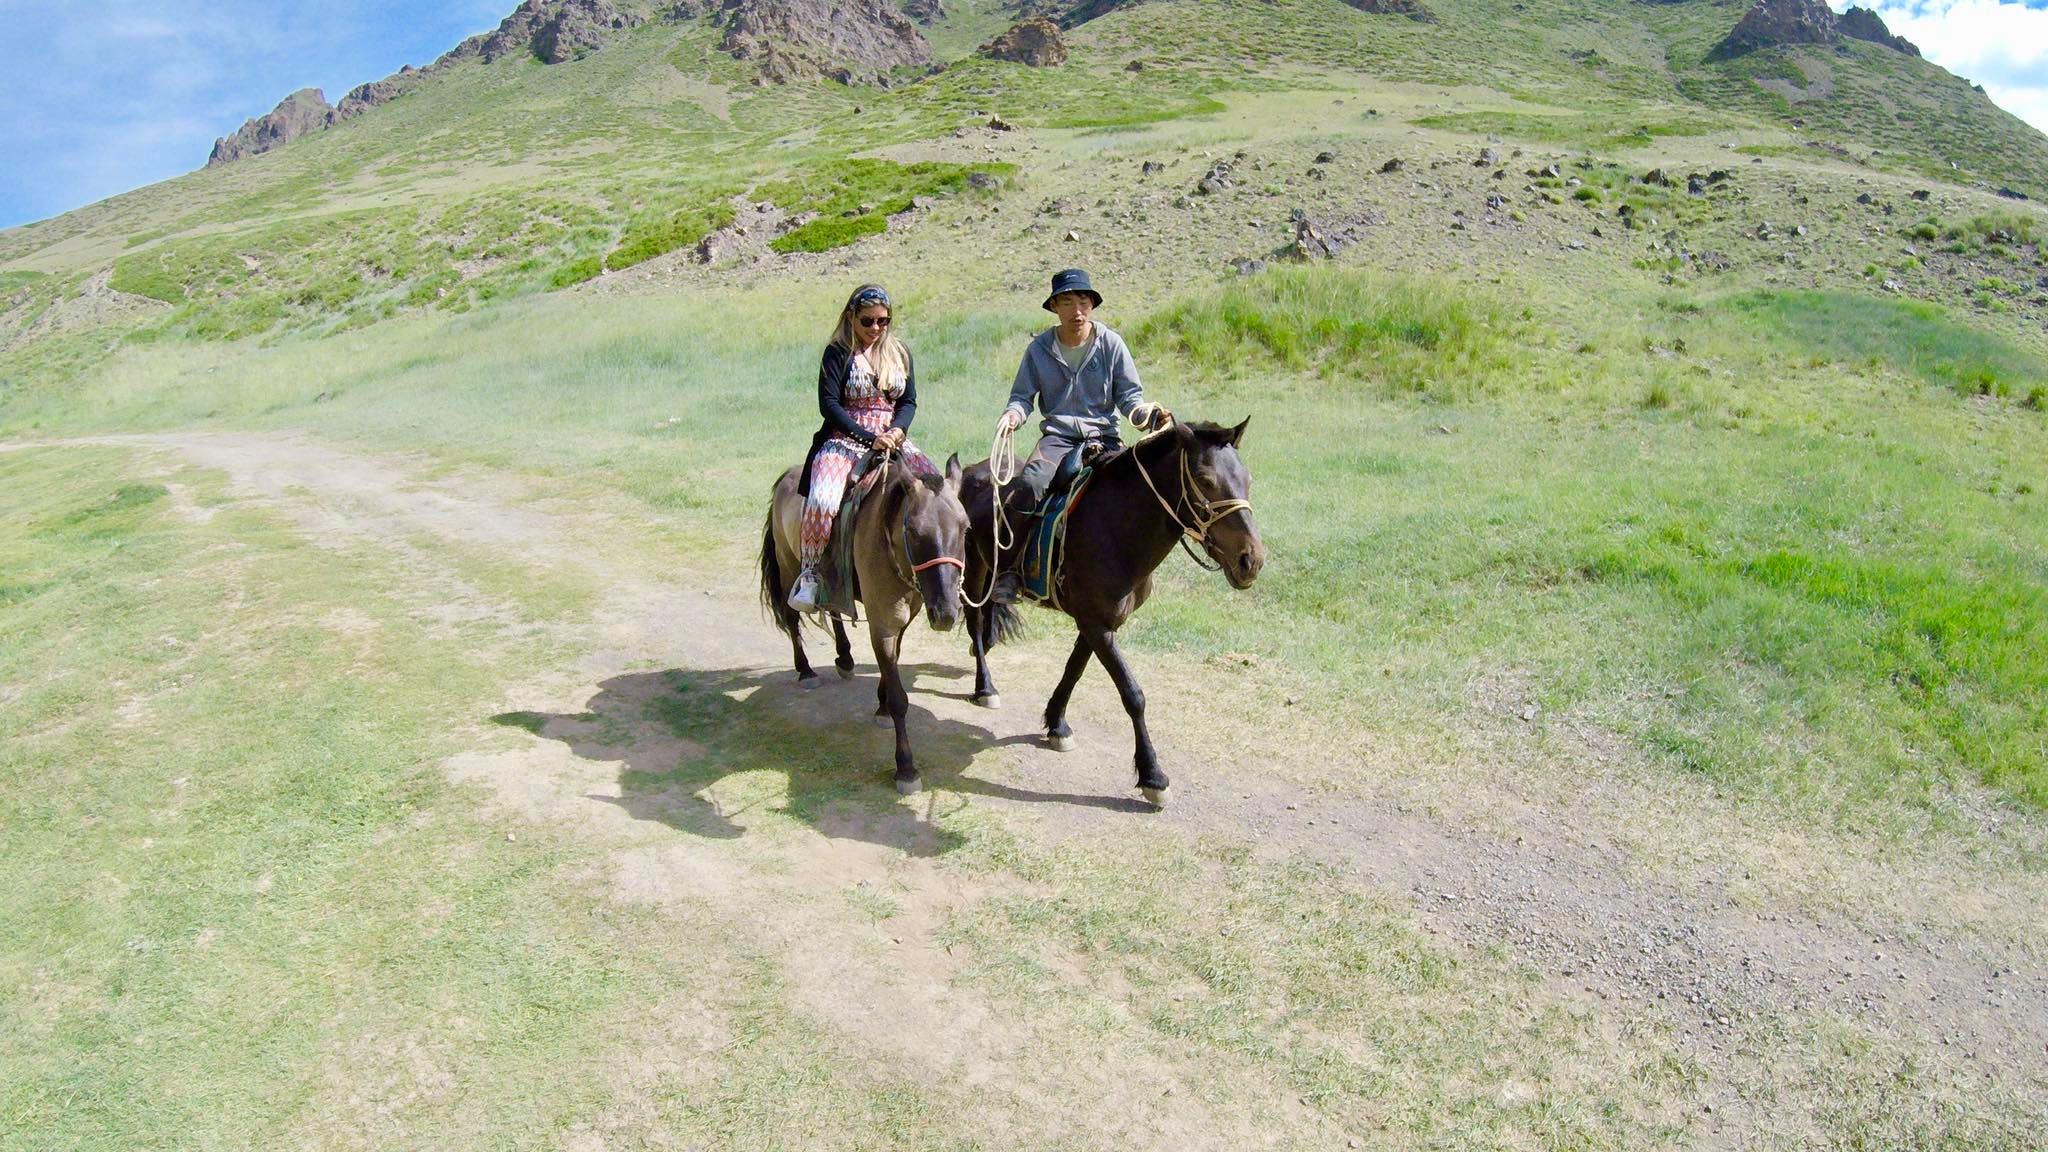 Kach Solo Travels in 2019 Horseback riding trip to the Gobi Gurvan Saikhan National Park.jpg